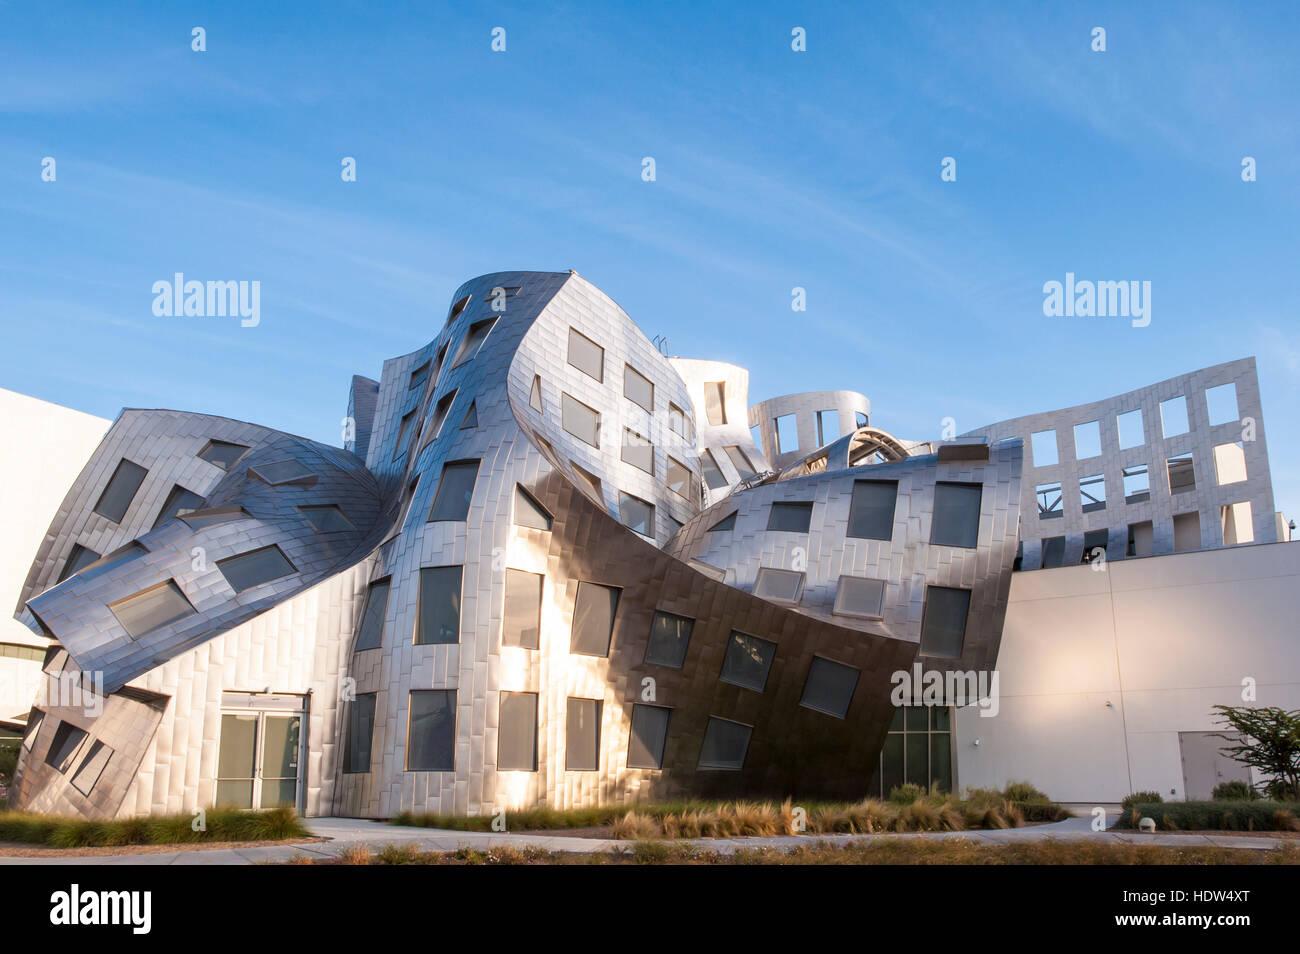 Cleveland Clinic Lou Ruvo centro de salud cerebral edificio diseñado por Frank Gehry, Las Vegas, Nevada. Foto de stock